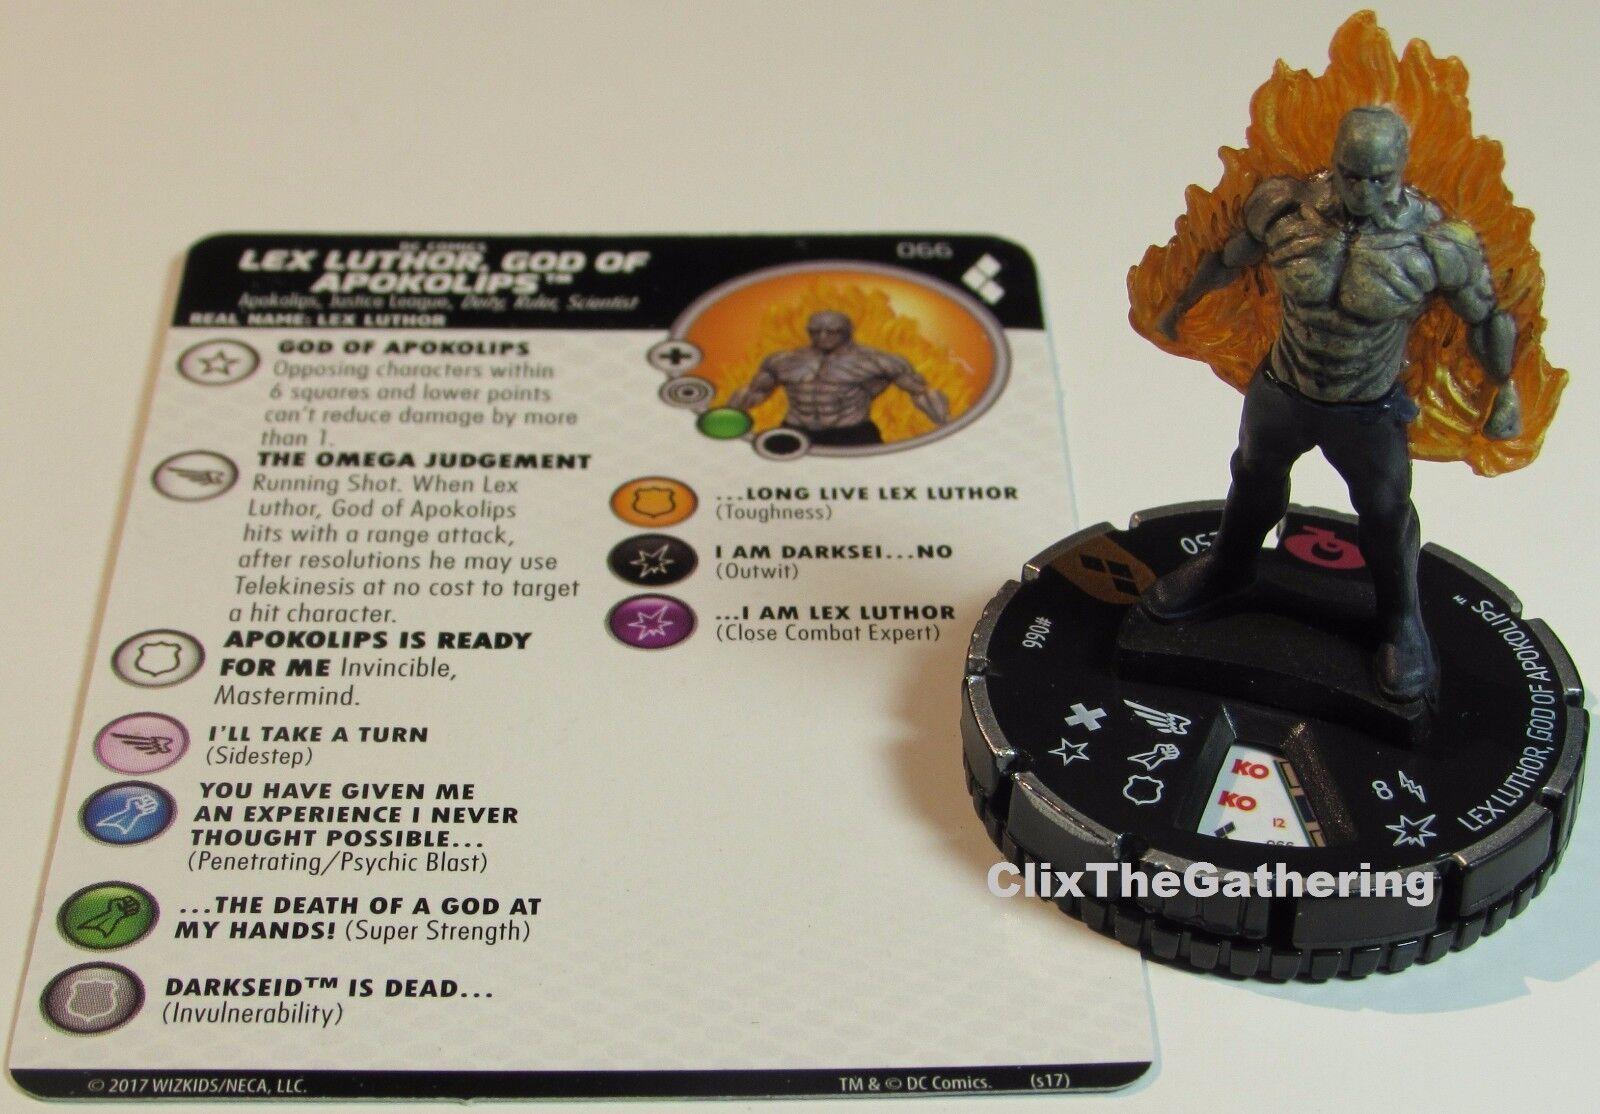 Lex Luthor God Of Apokolips 066 Harley Quinn et 'Gotham Filles Heroclix